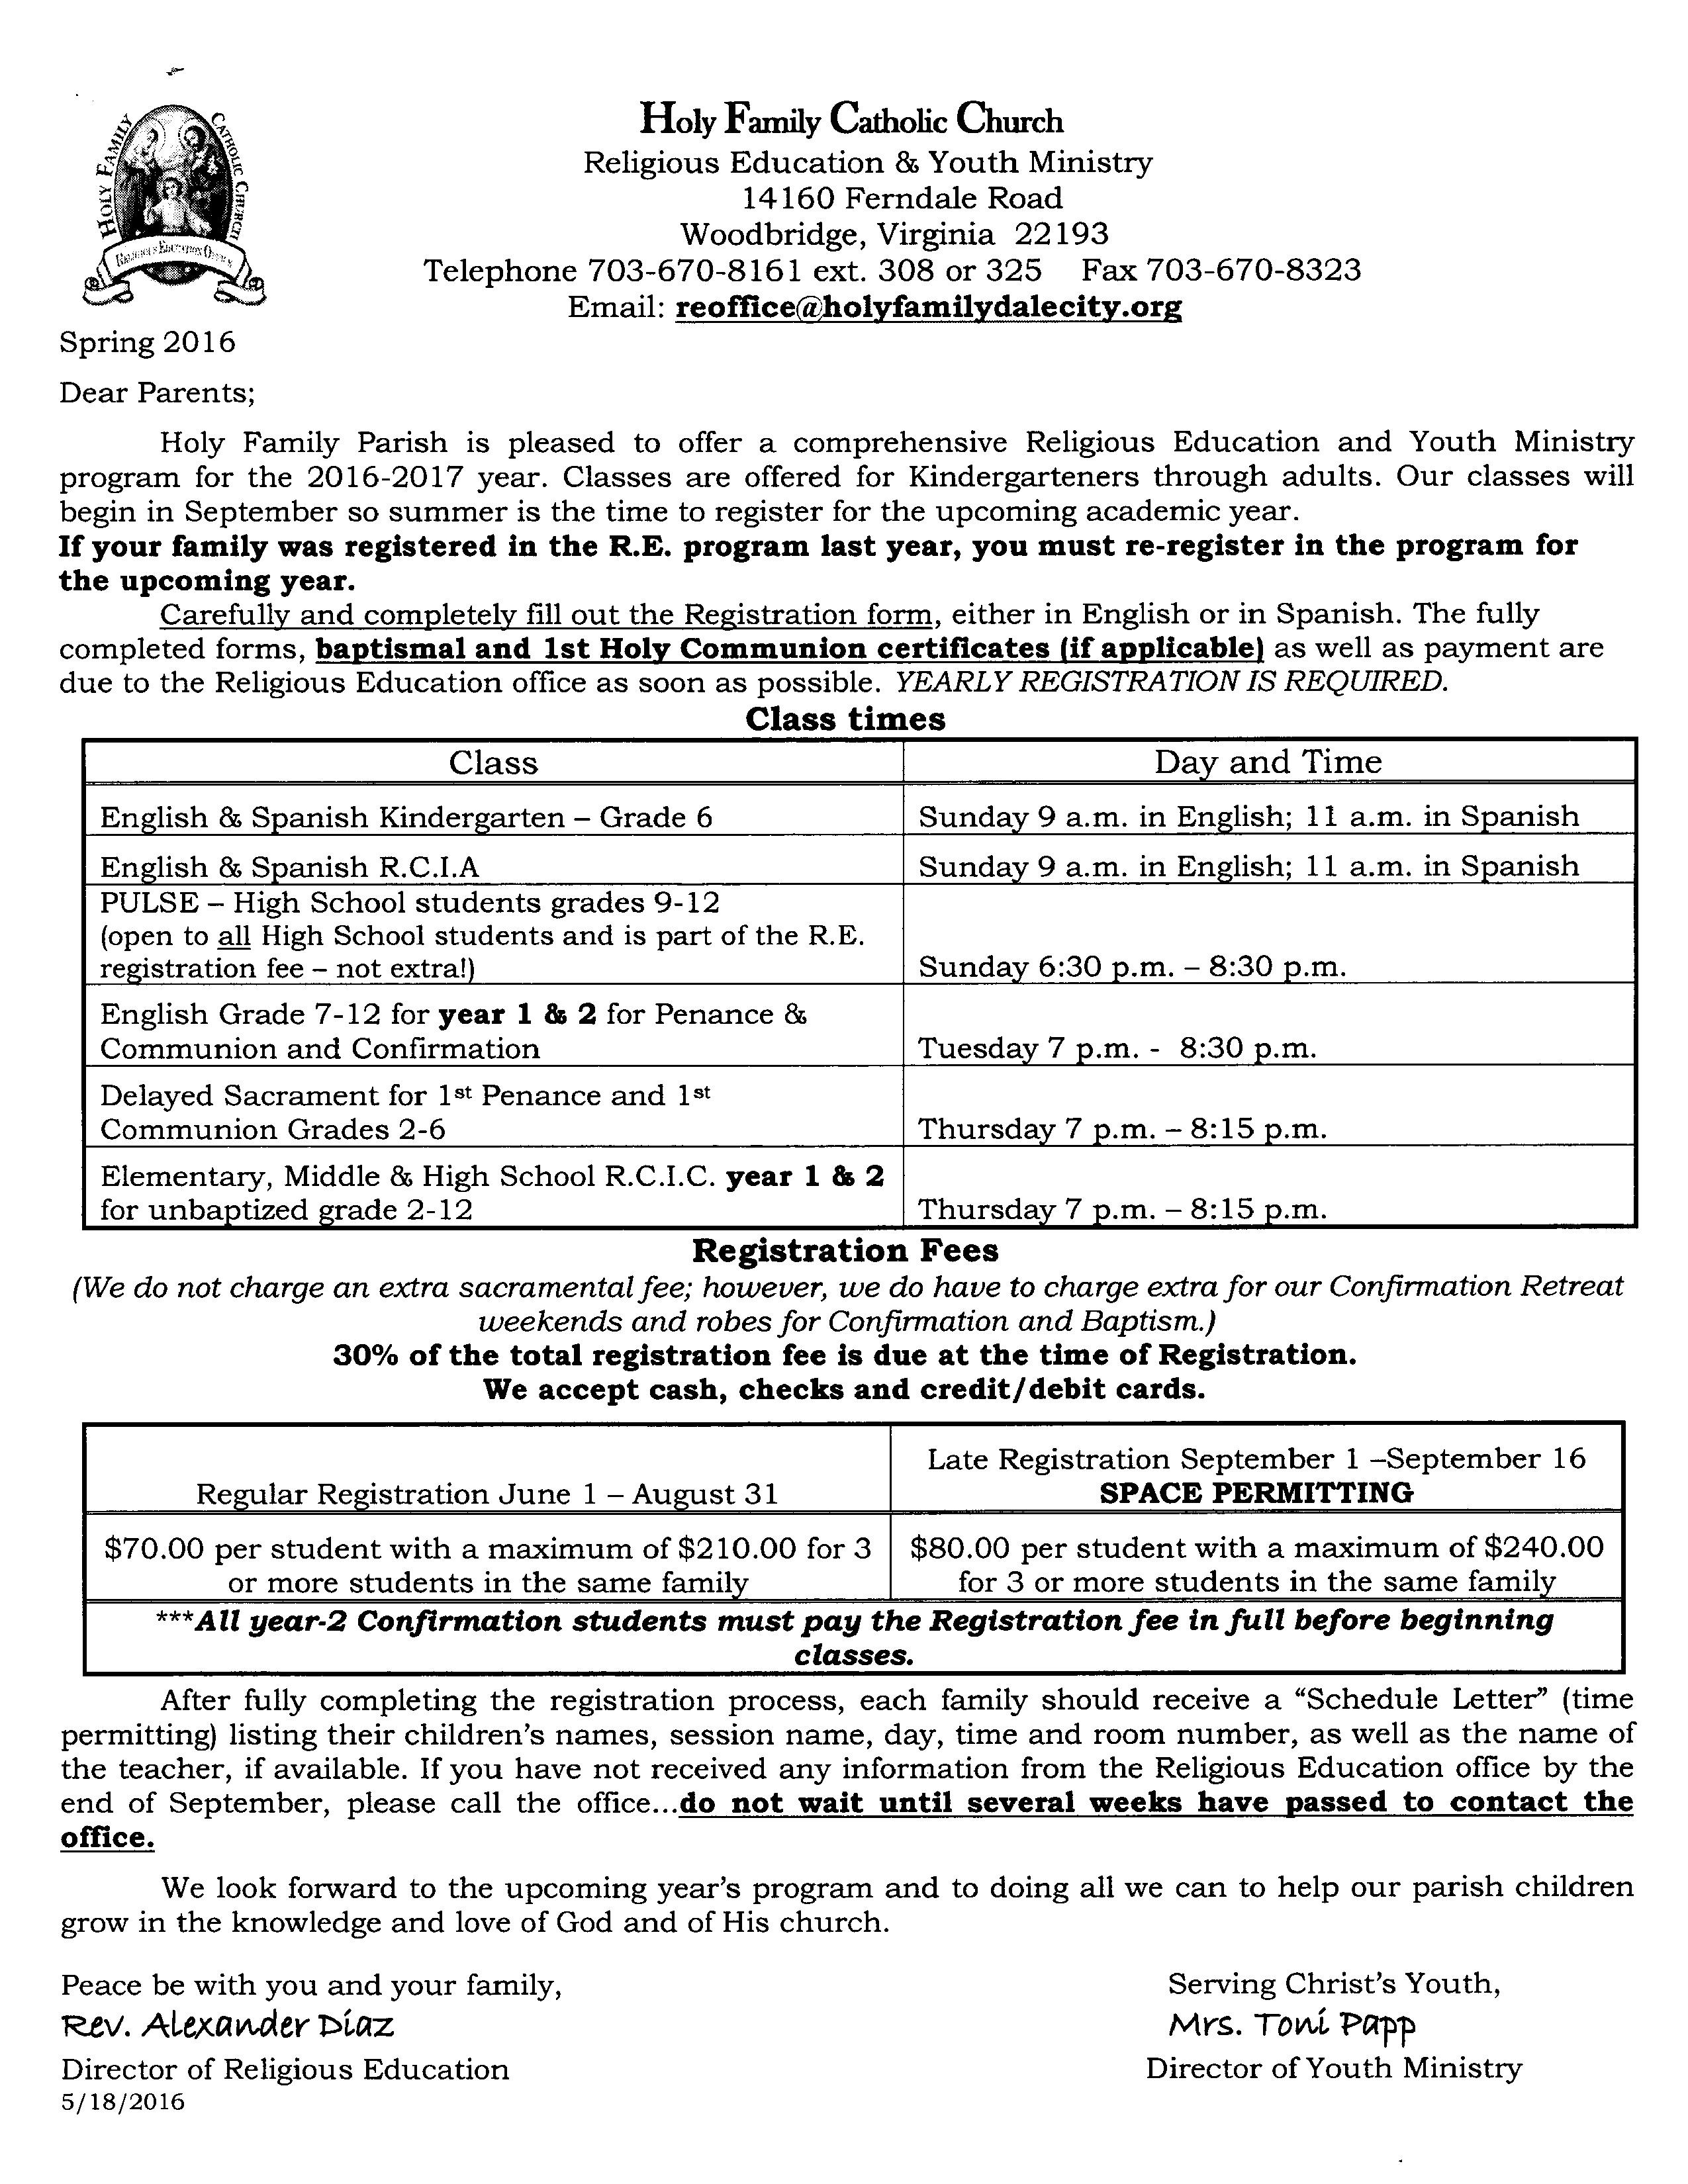 2016 - 2017 CCD Program Information (E)